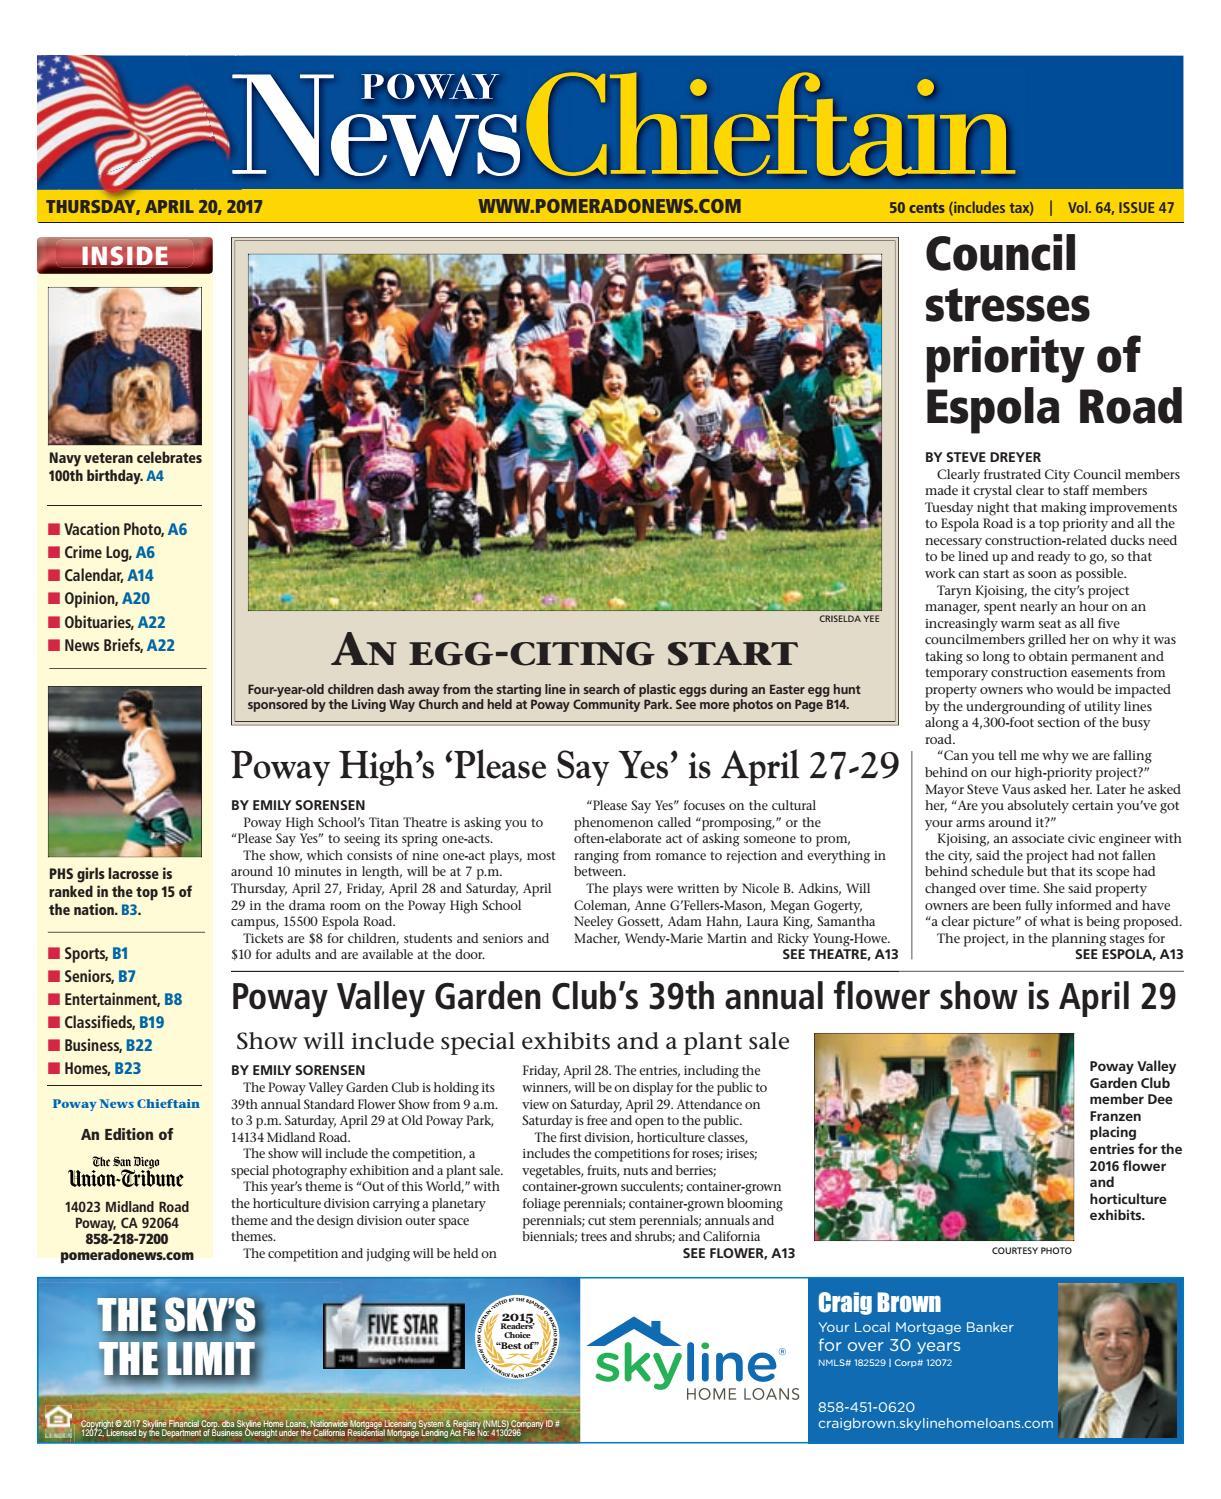 Poway News Chieftain 04 20 17 By MainStreet Media   Issuu